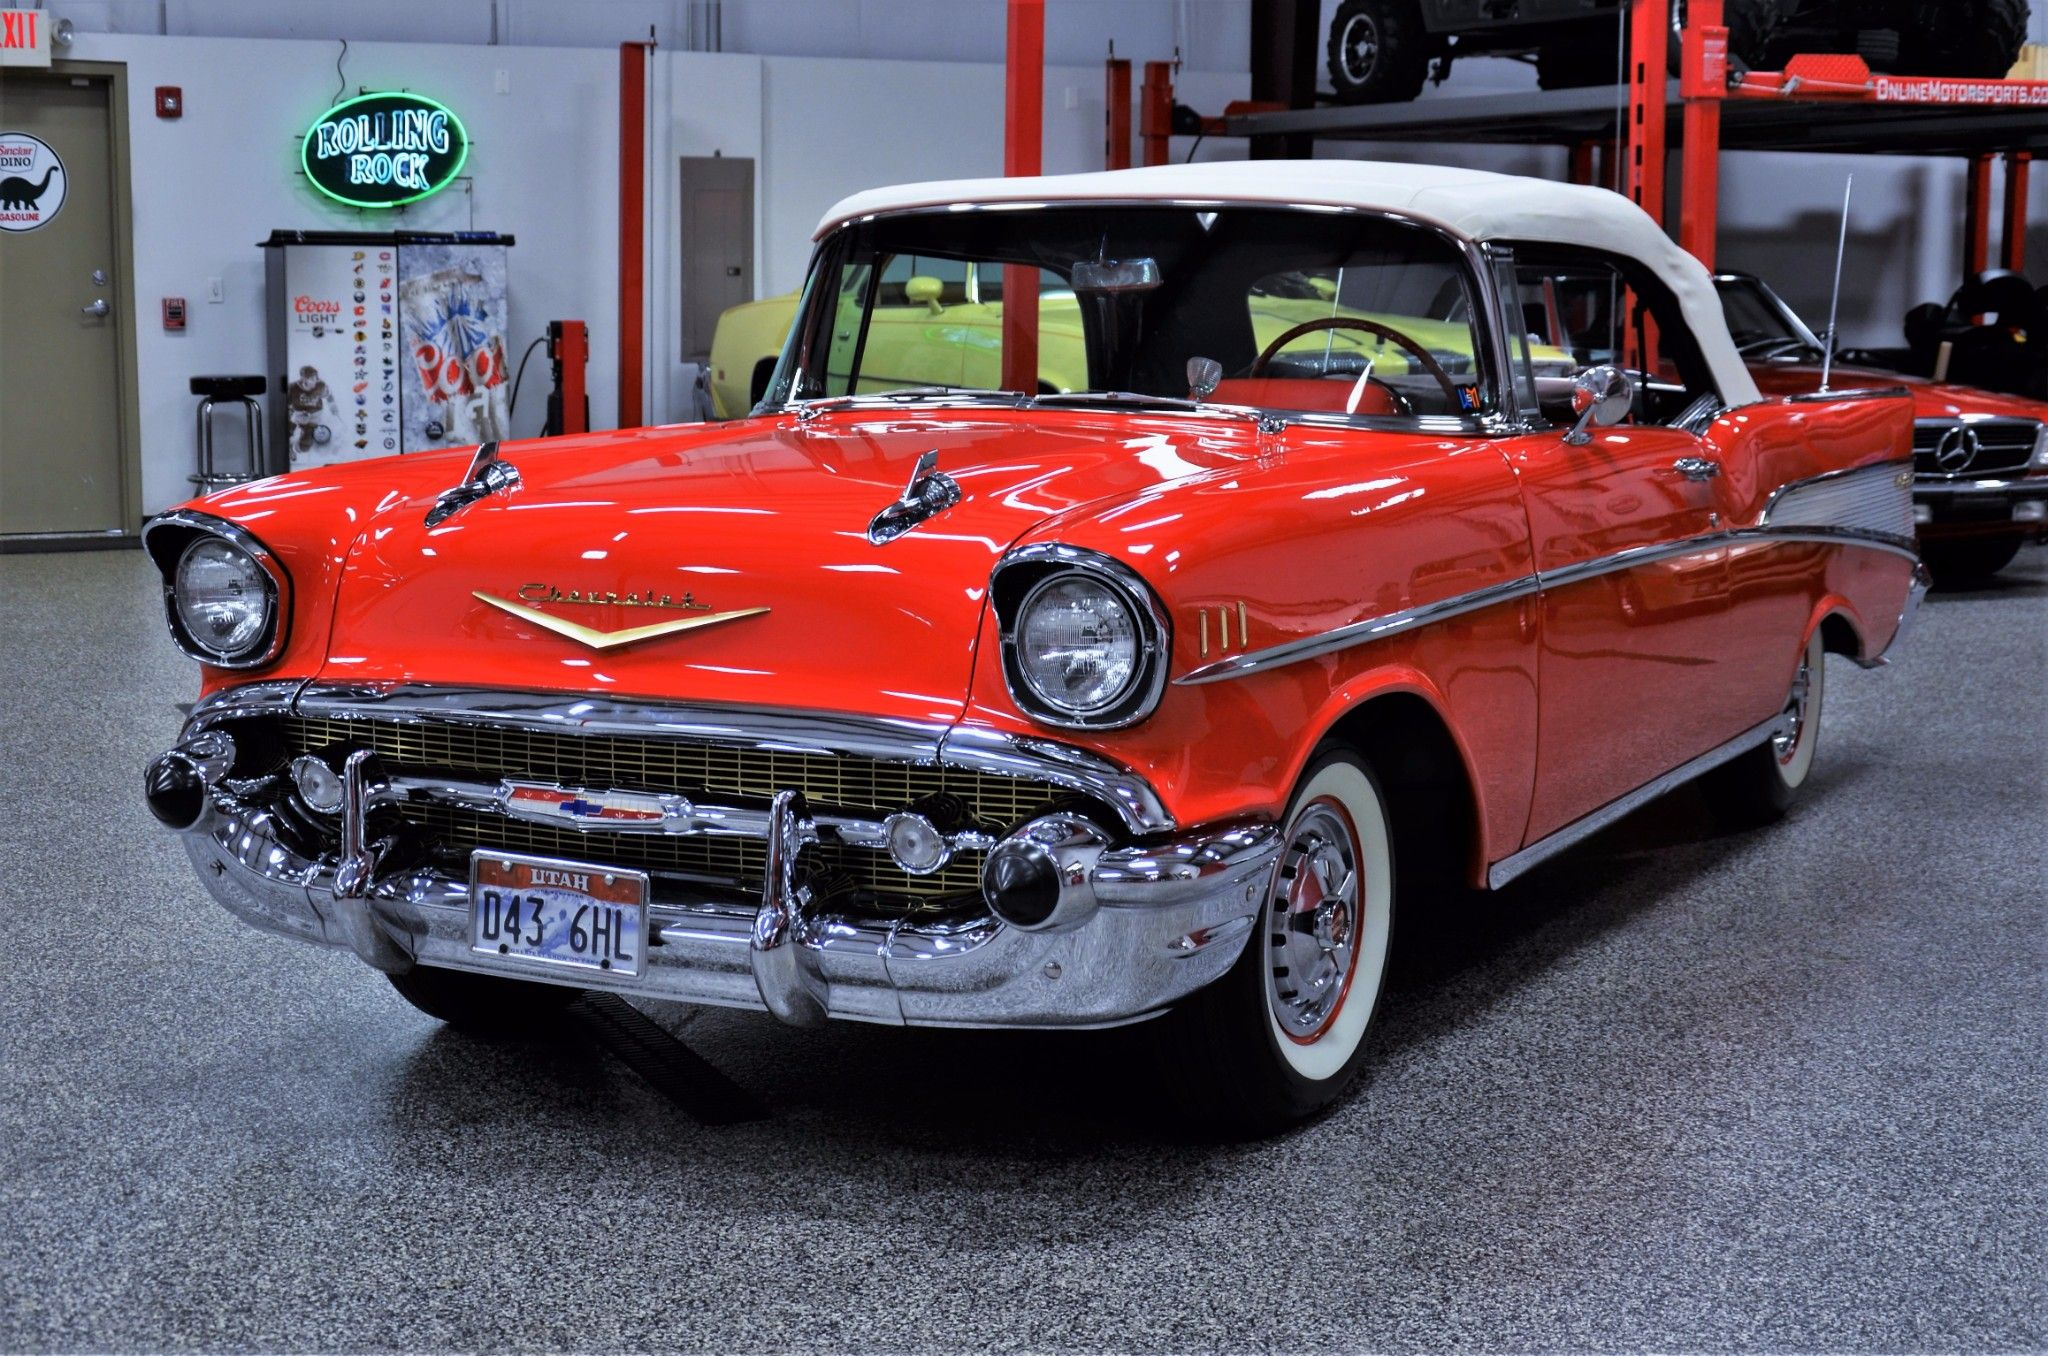 1957 Chevrolet Bel Air Convertible 283 Power Pack Chevrolet Bel